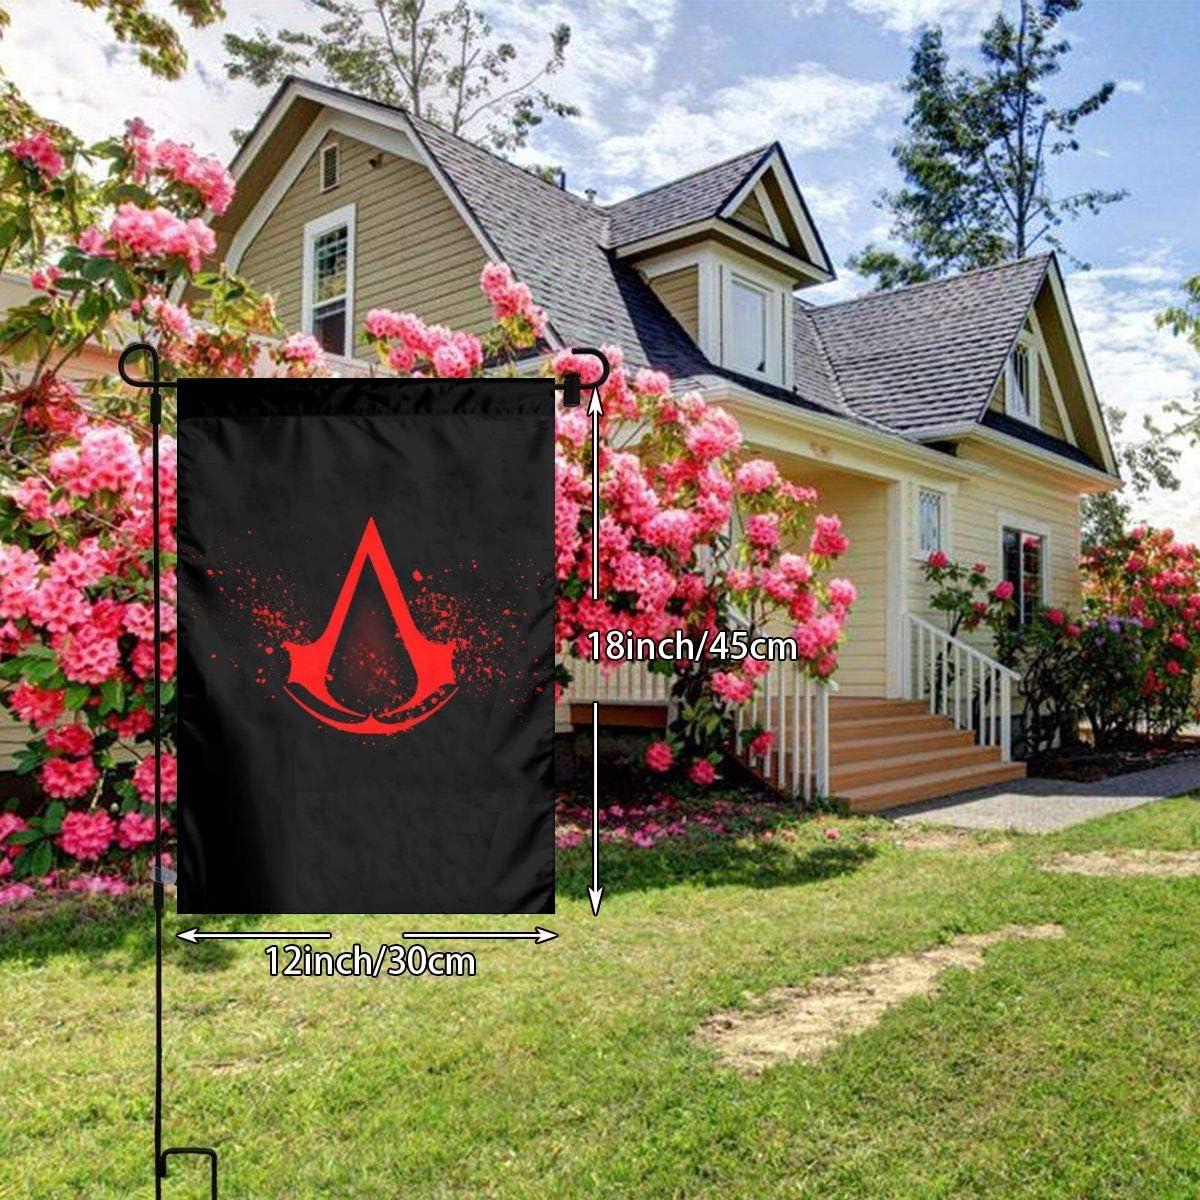 A Assassins Creed banderas bandera bandera bandera Banner poli/éster Material Gartenbalkon Gartendekoration al aire libre 30x45 cm N